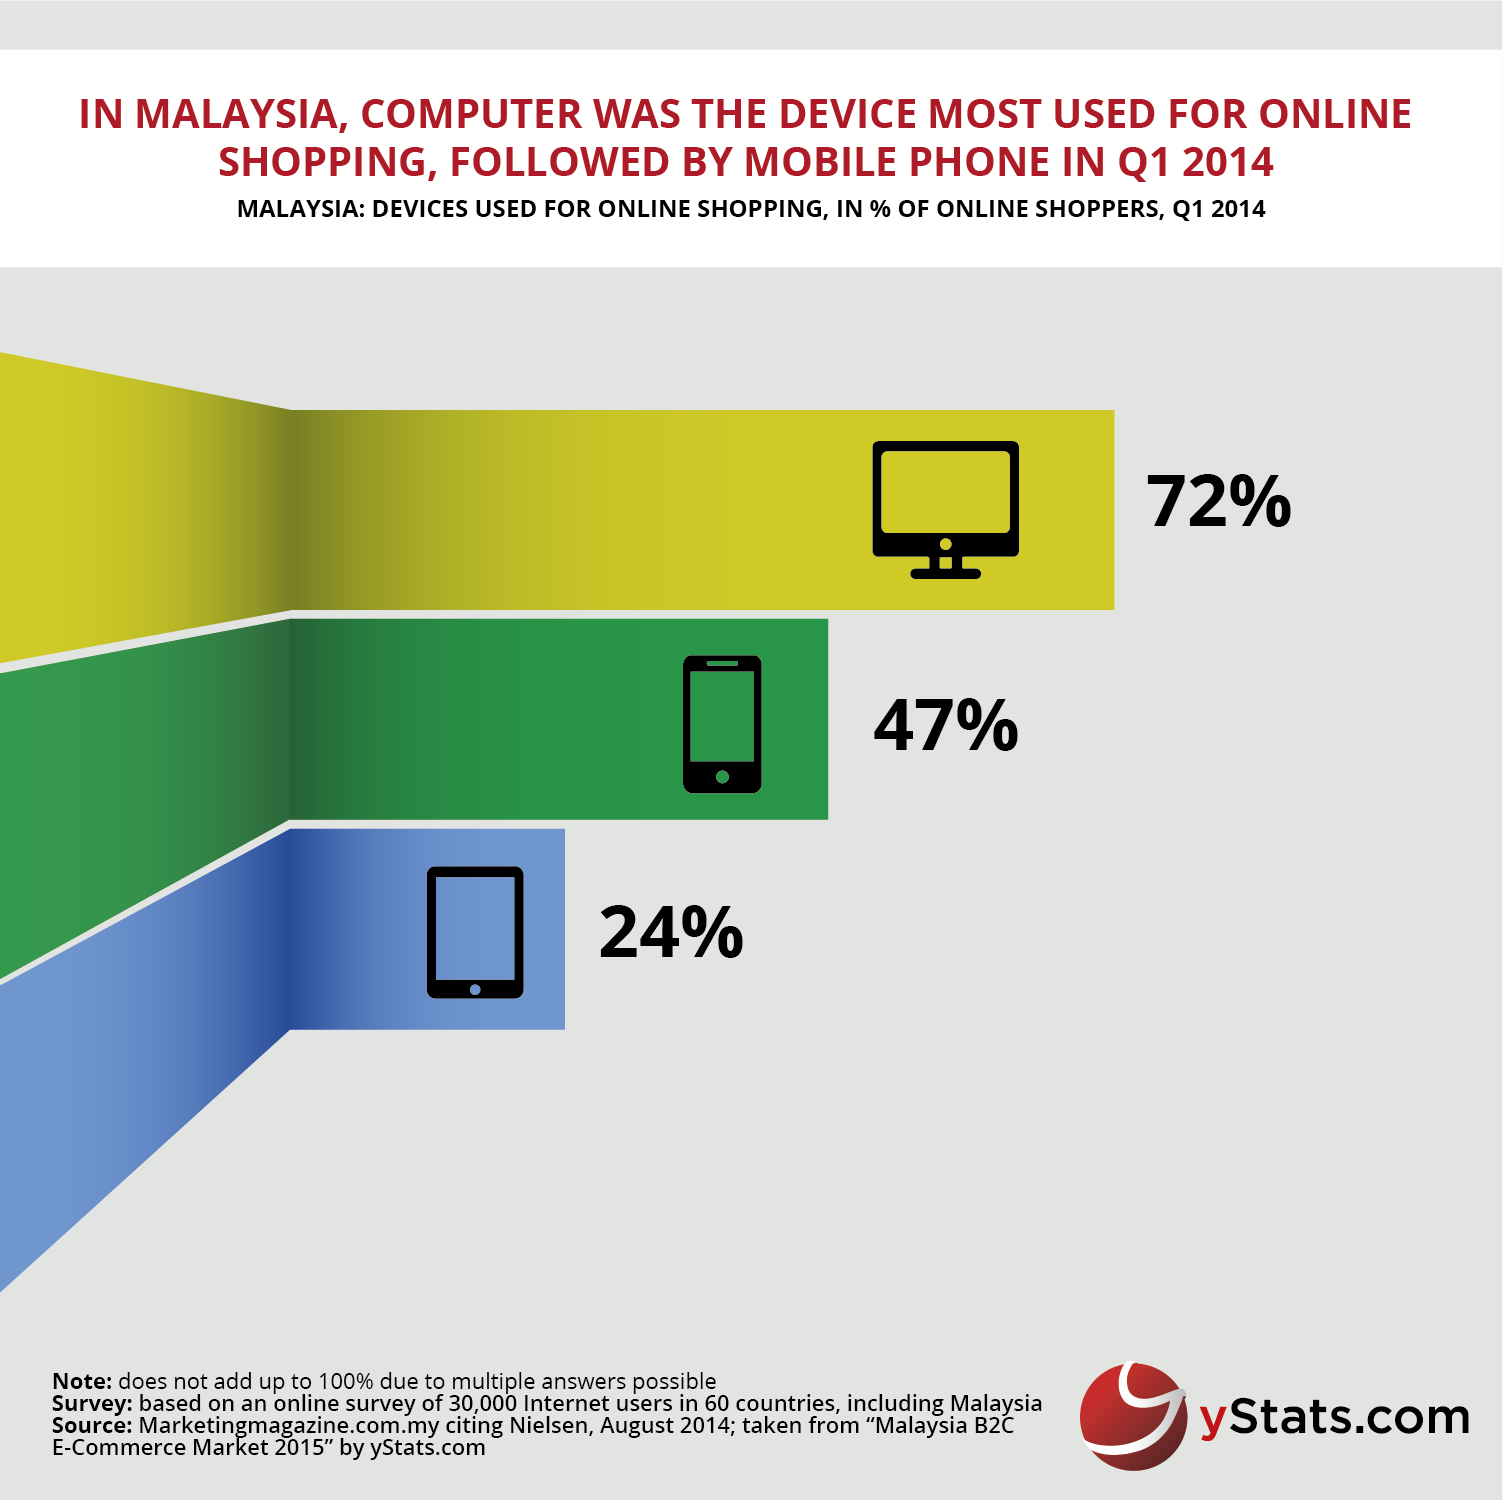 yStats.com Infographic Malaysia B2C E-Commerce Market 2015